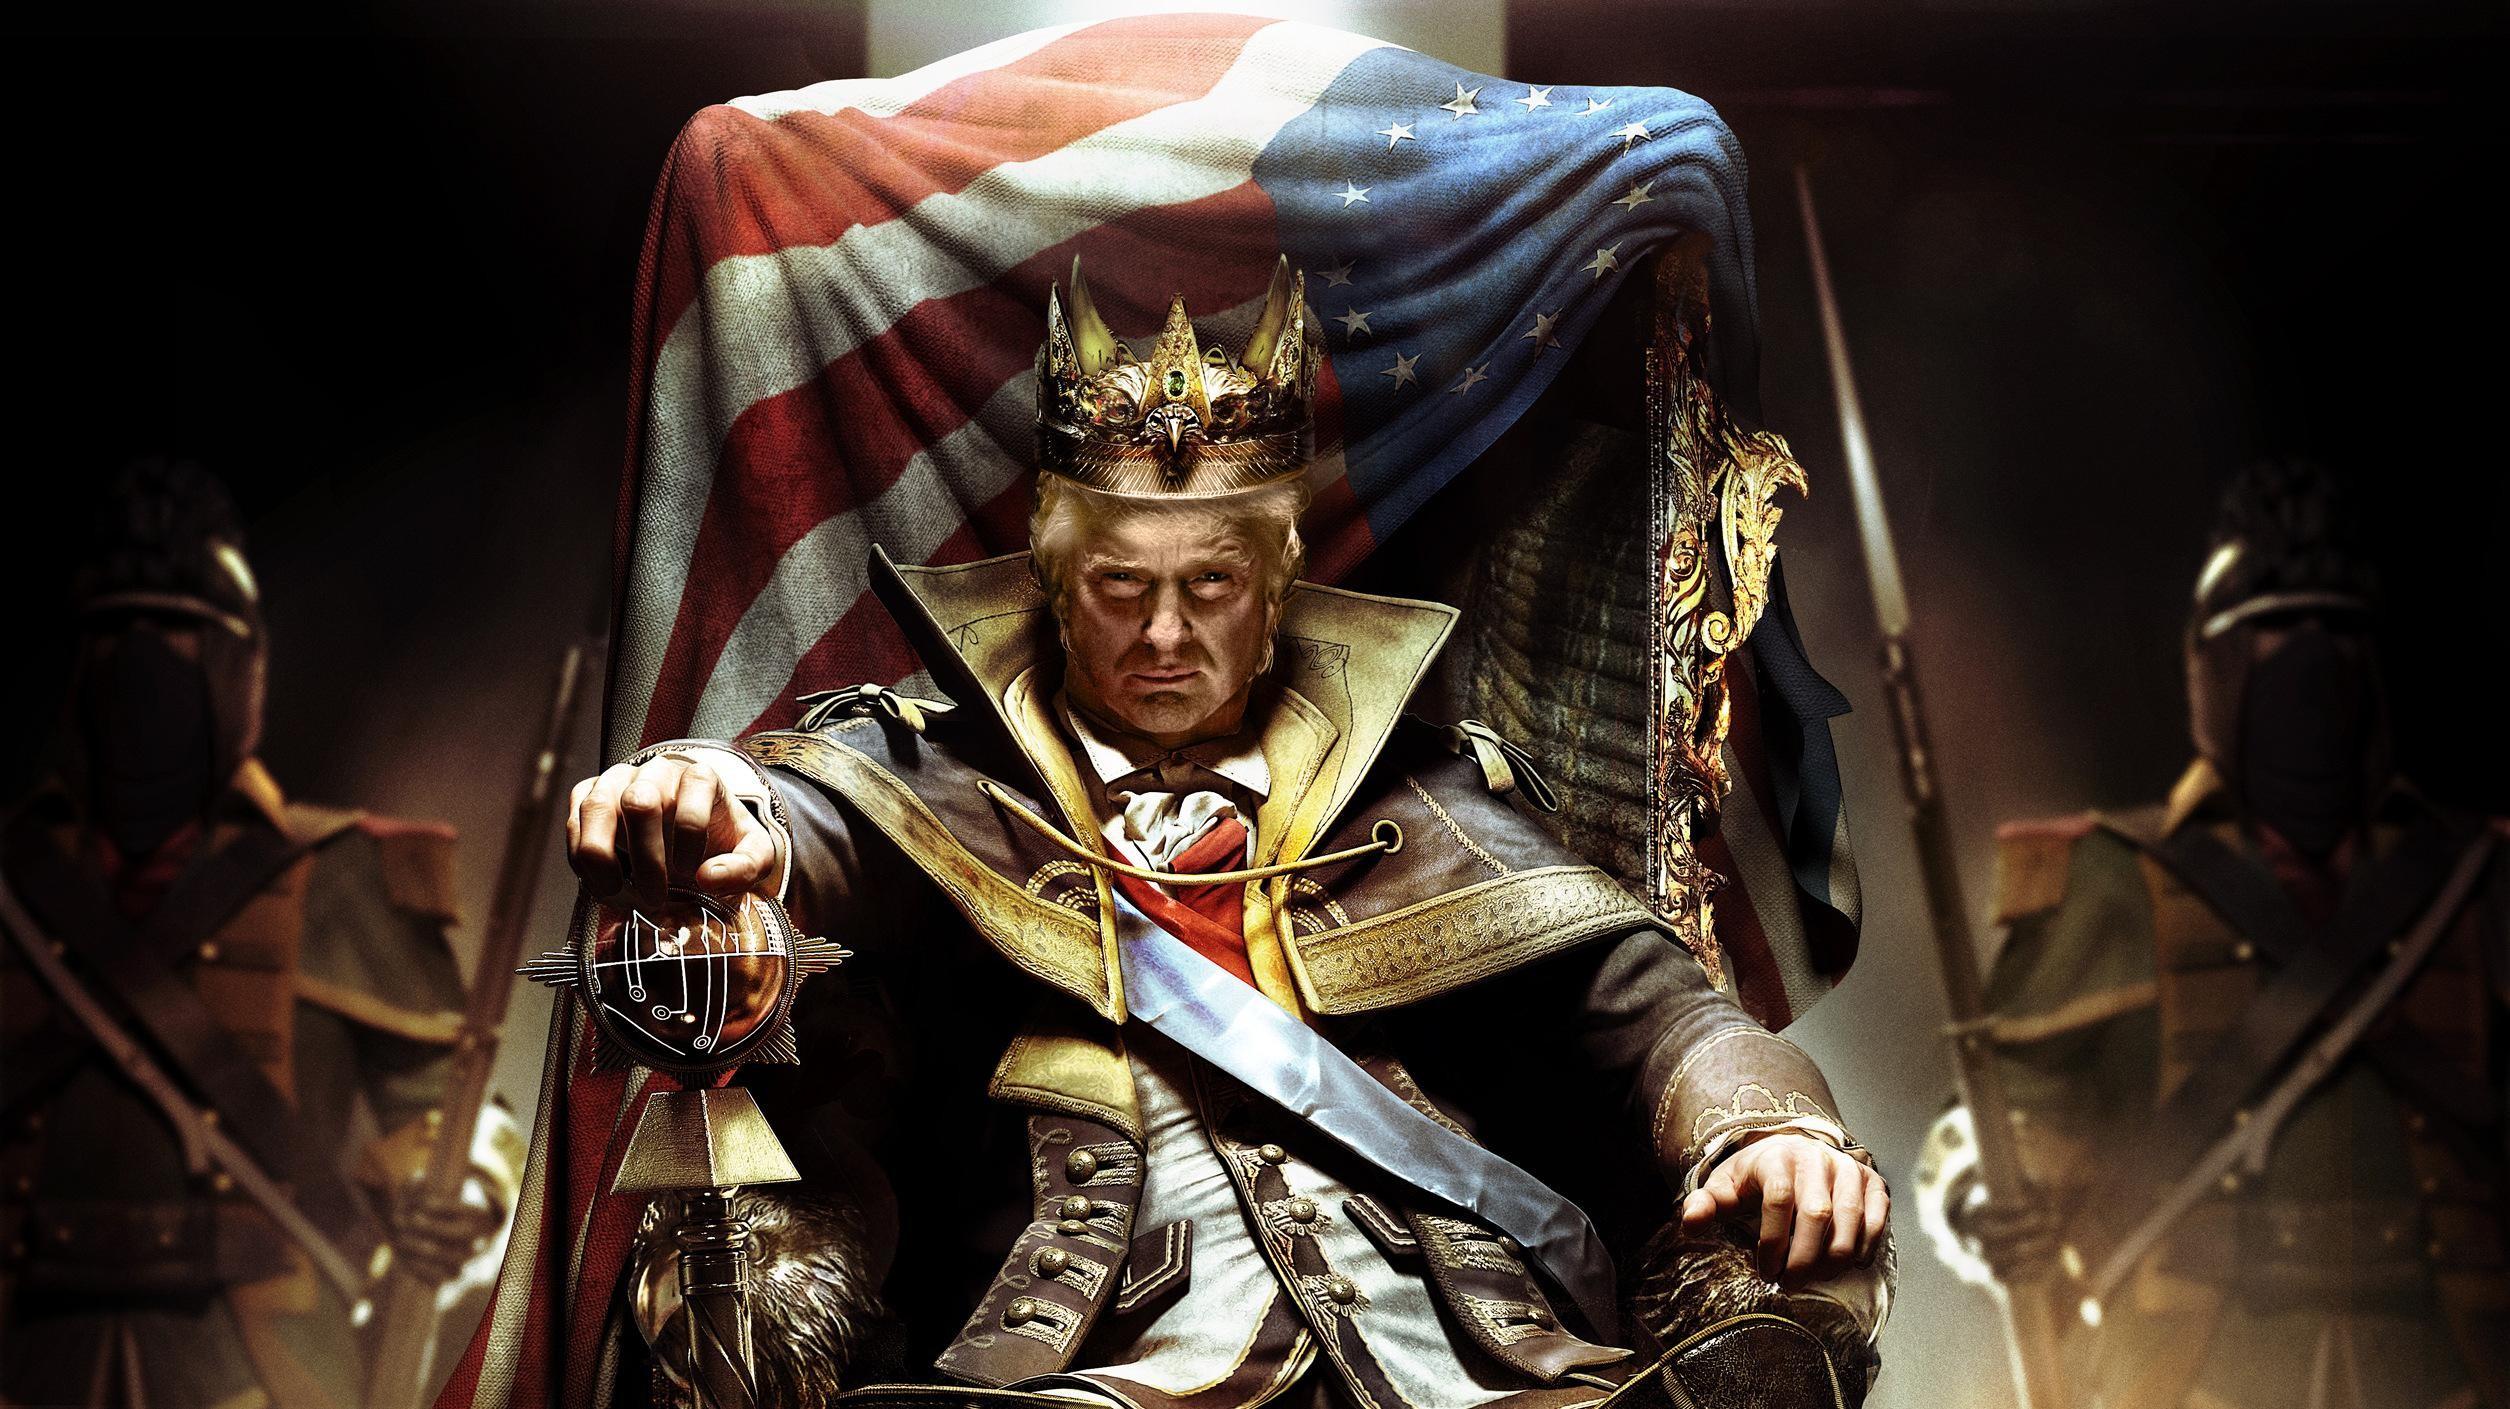 King Trump Wallpaper (1440p) …